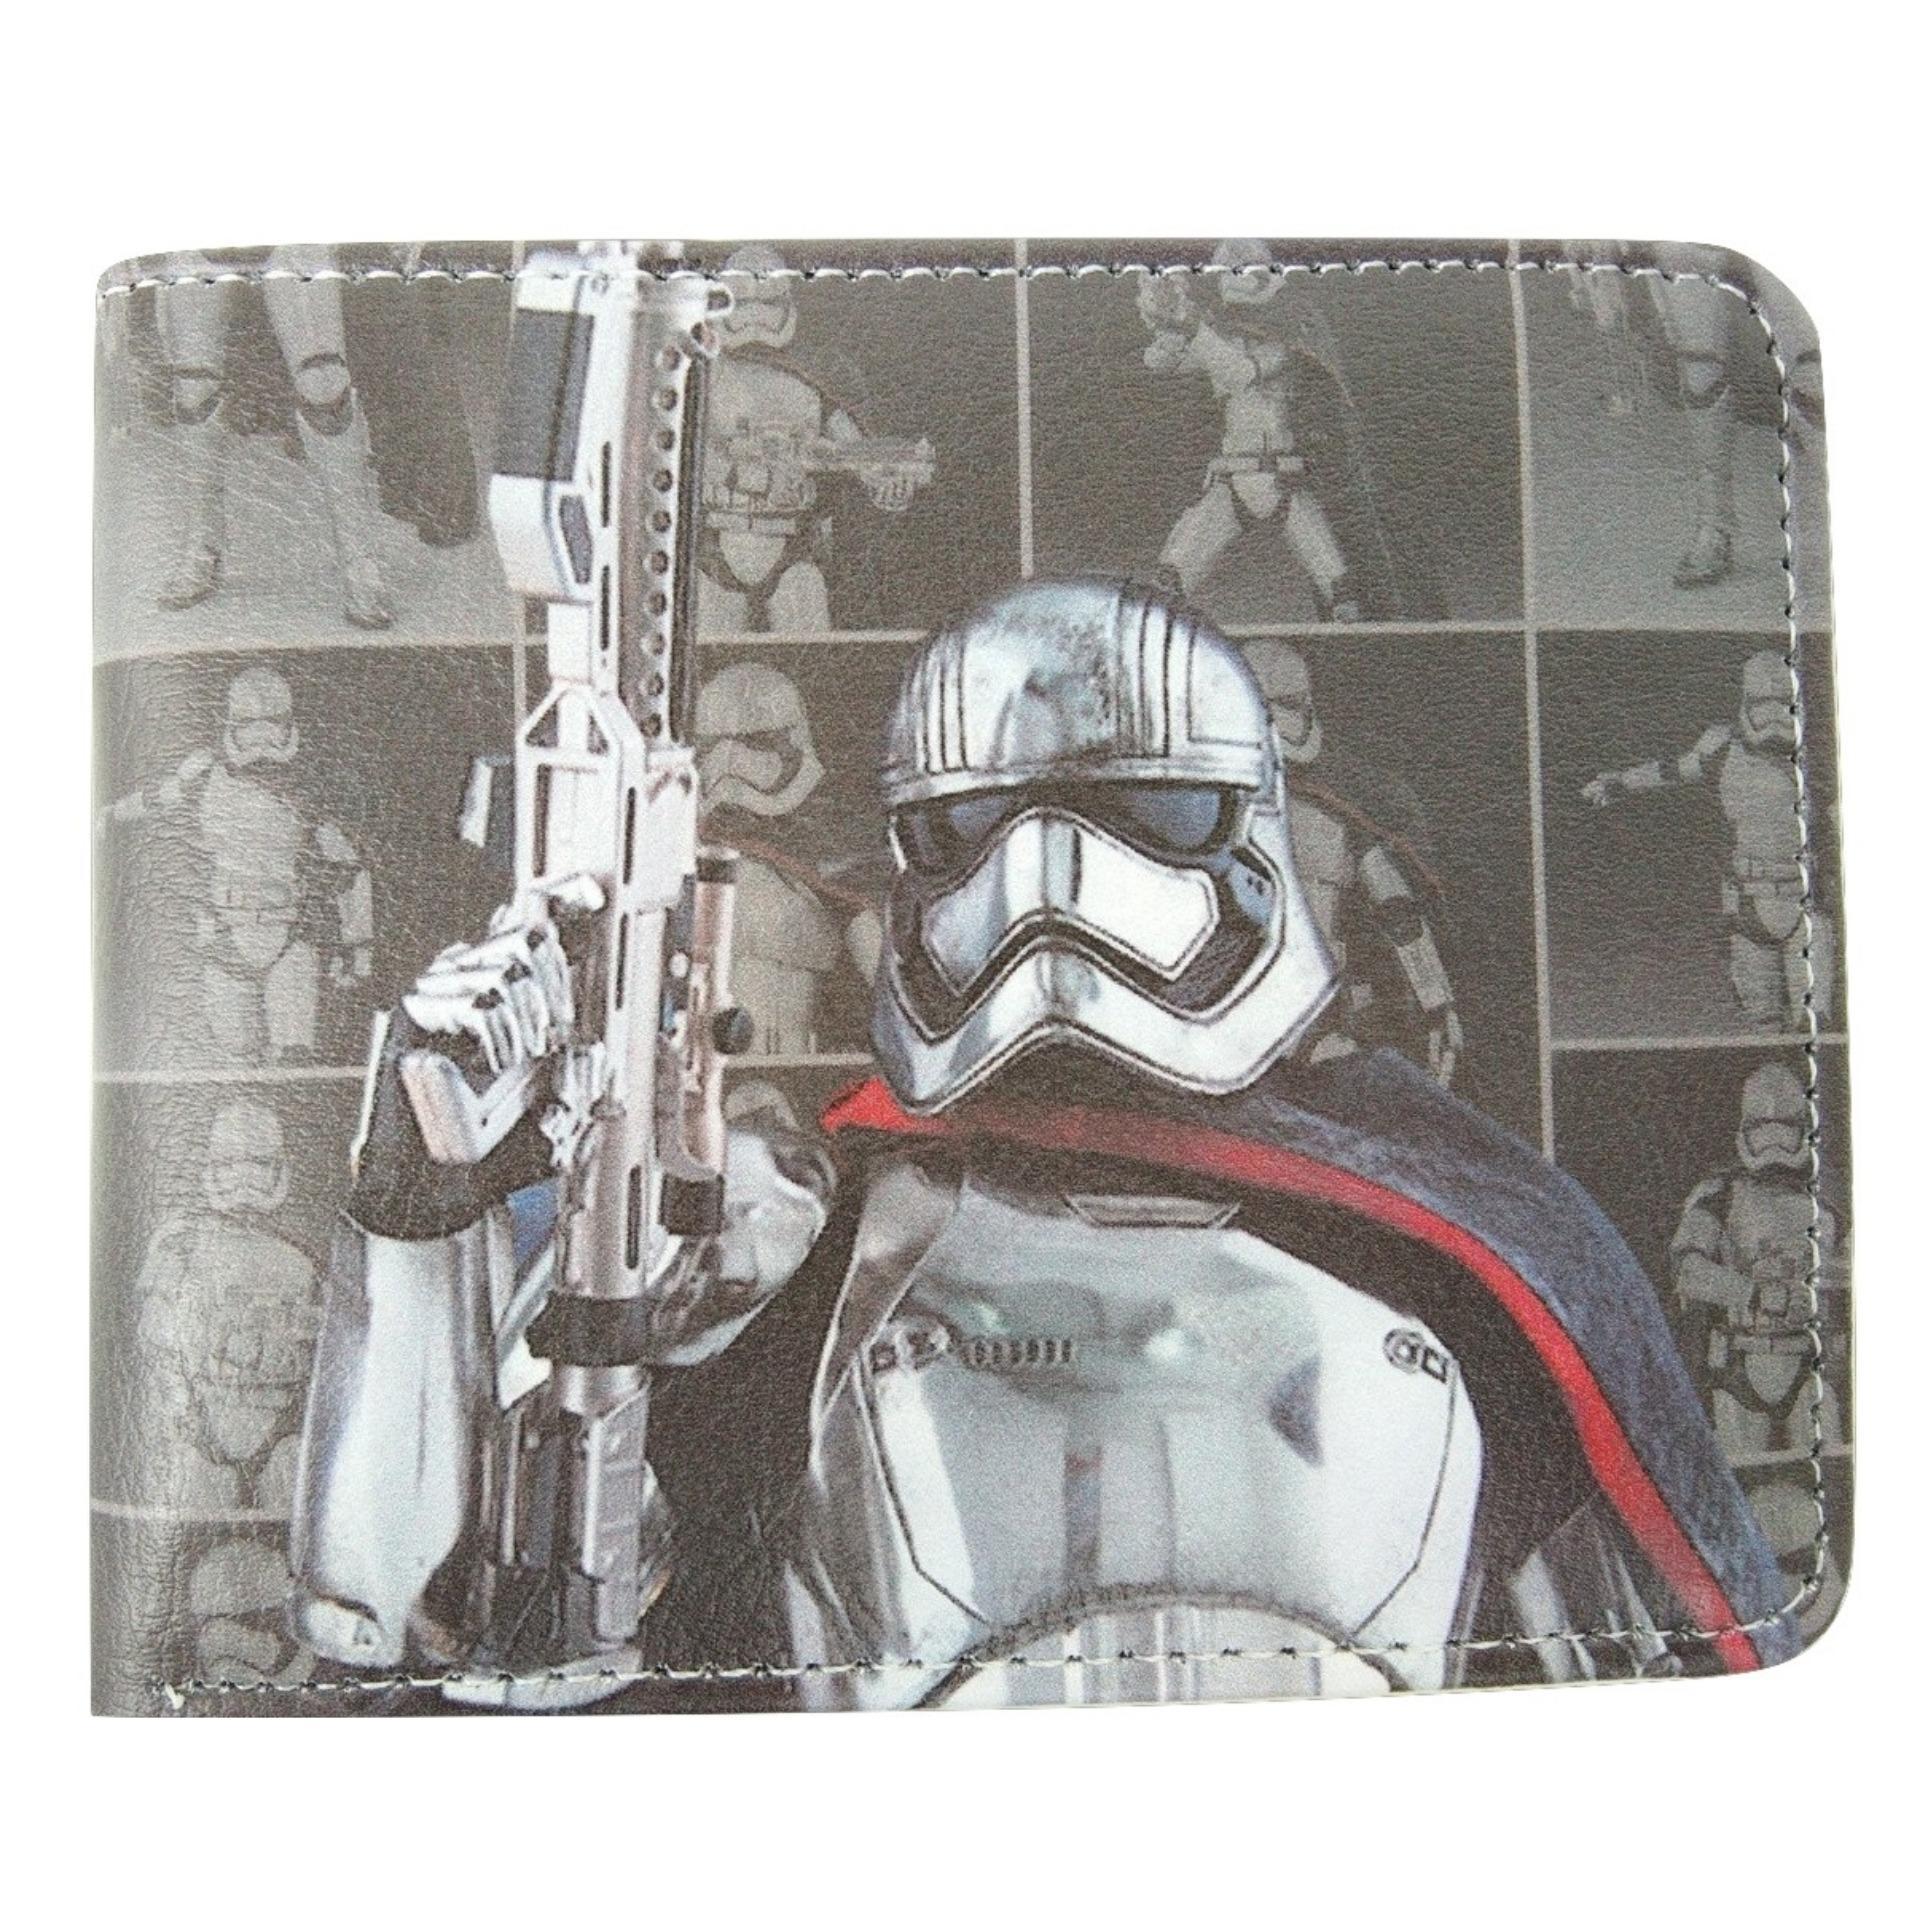 Katalog Jcf Dompet Anak Laki Fashion Branded Pu Leather Import Lipat Bagus Star Wars Terbaru